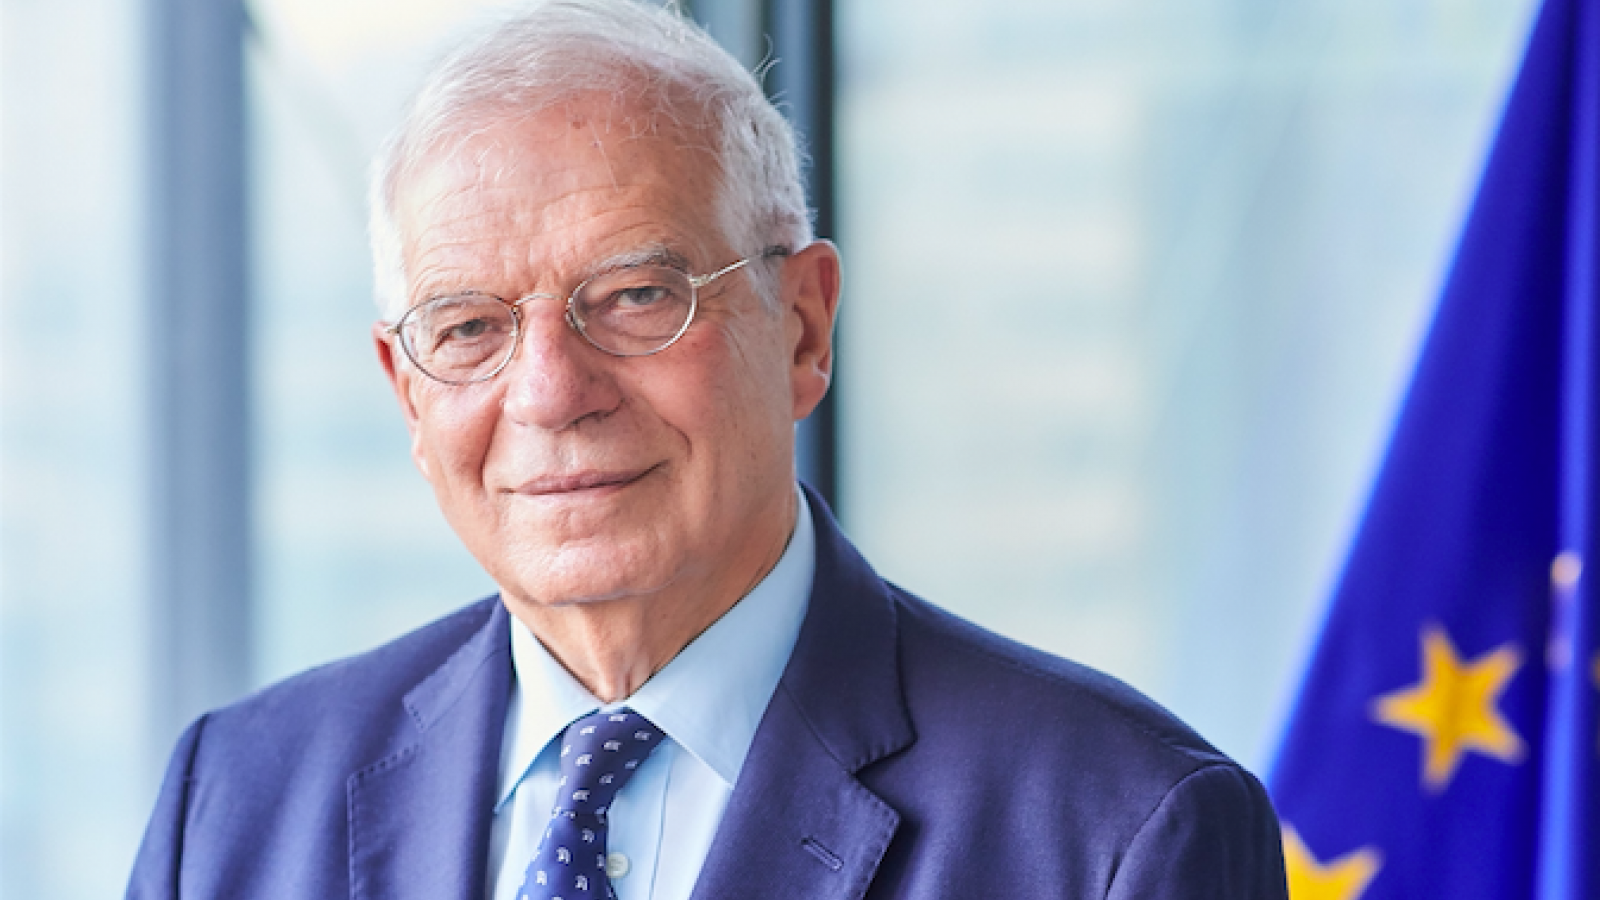 Borrell: Είναι σημαντικό να συνεχίσουμε να ενθαρρύνουμε τις θετικές εξελίξεις με την Τουρκία